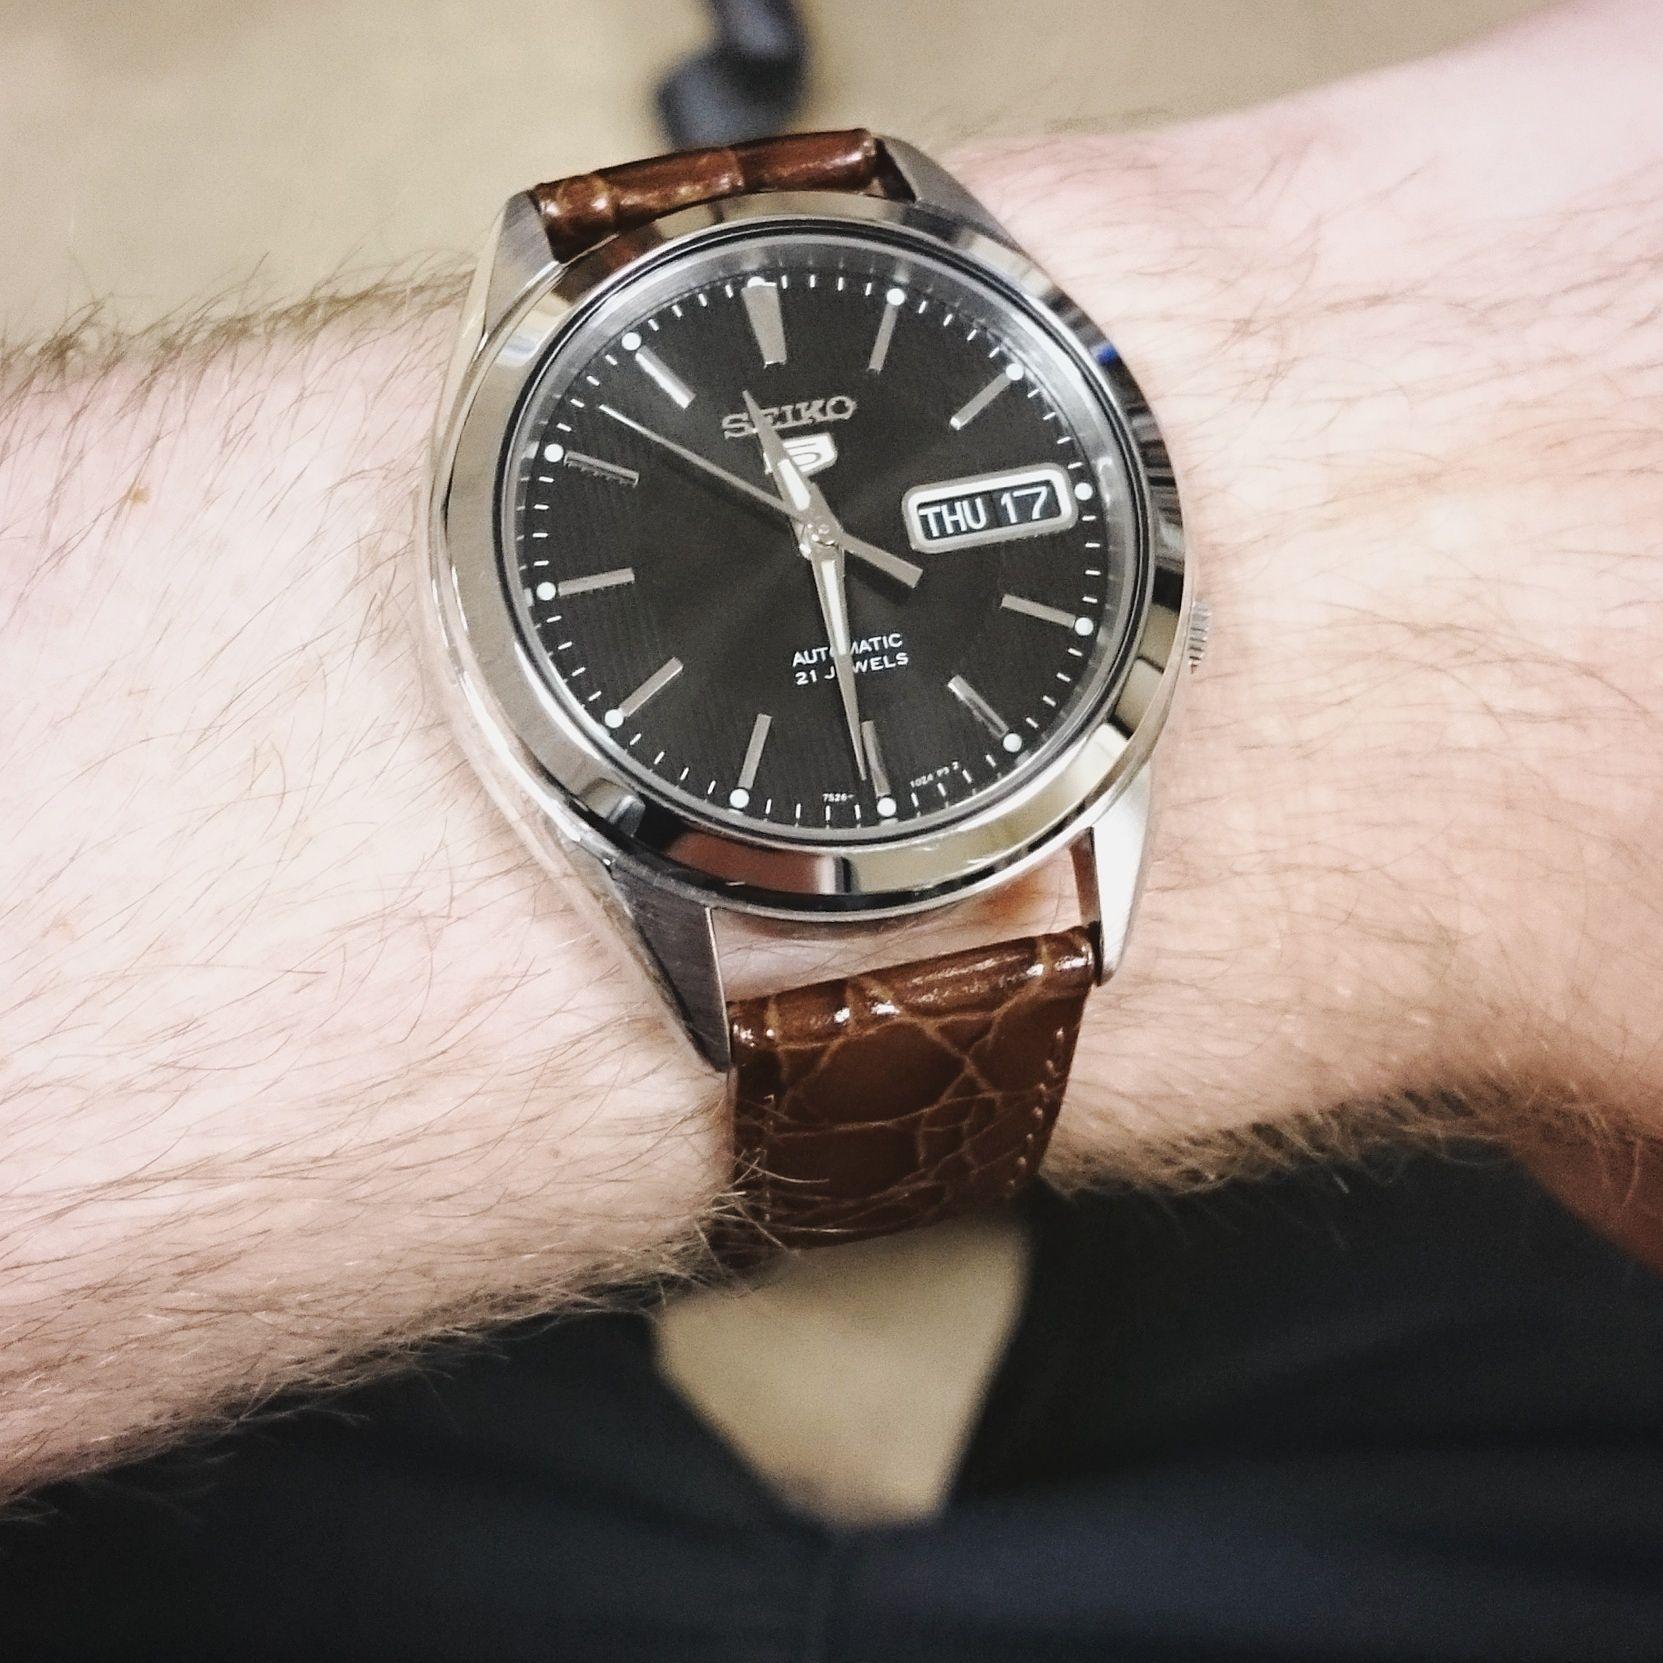 Seiko 5 Snkl23 W Hirsch Brown Crocograin Strap Watches Seiko